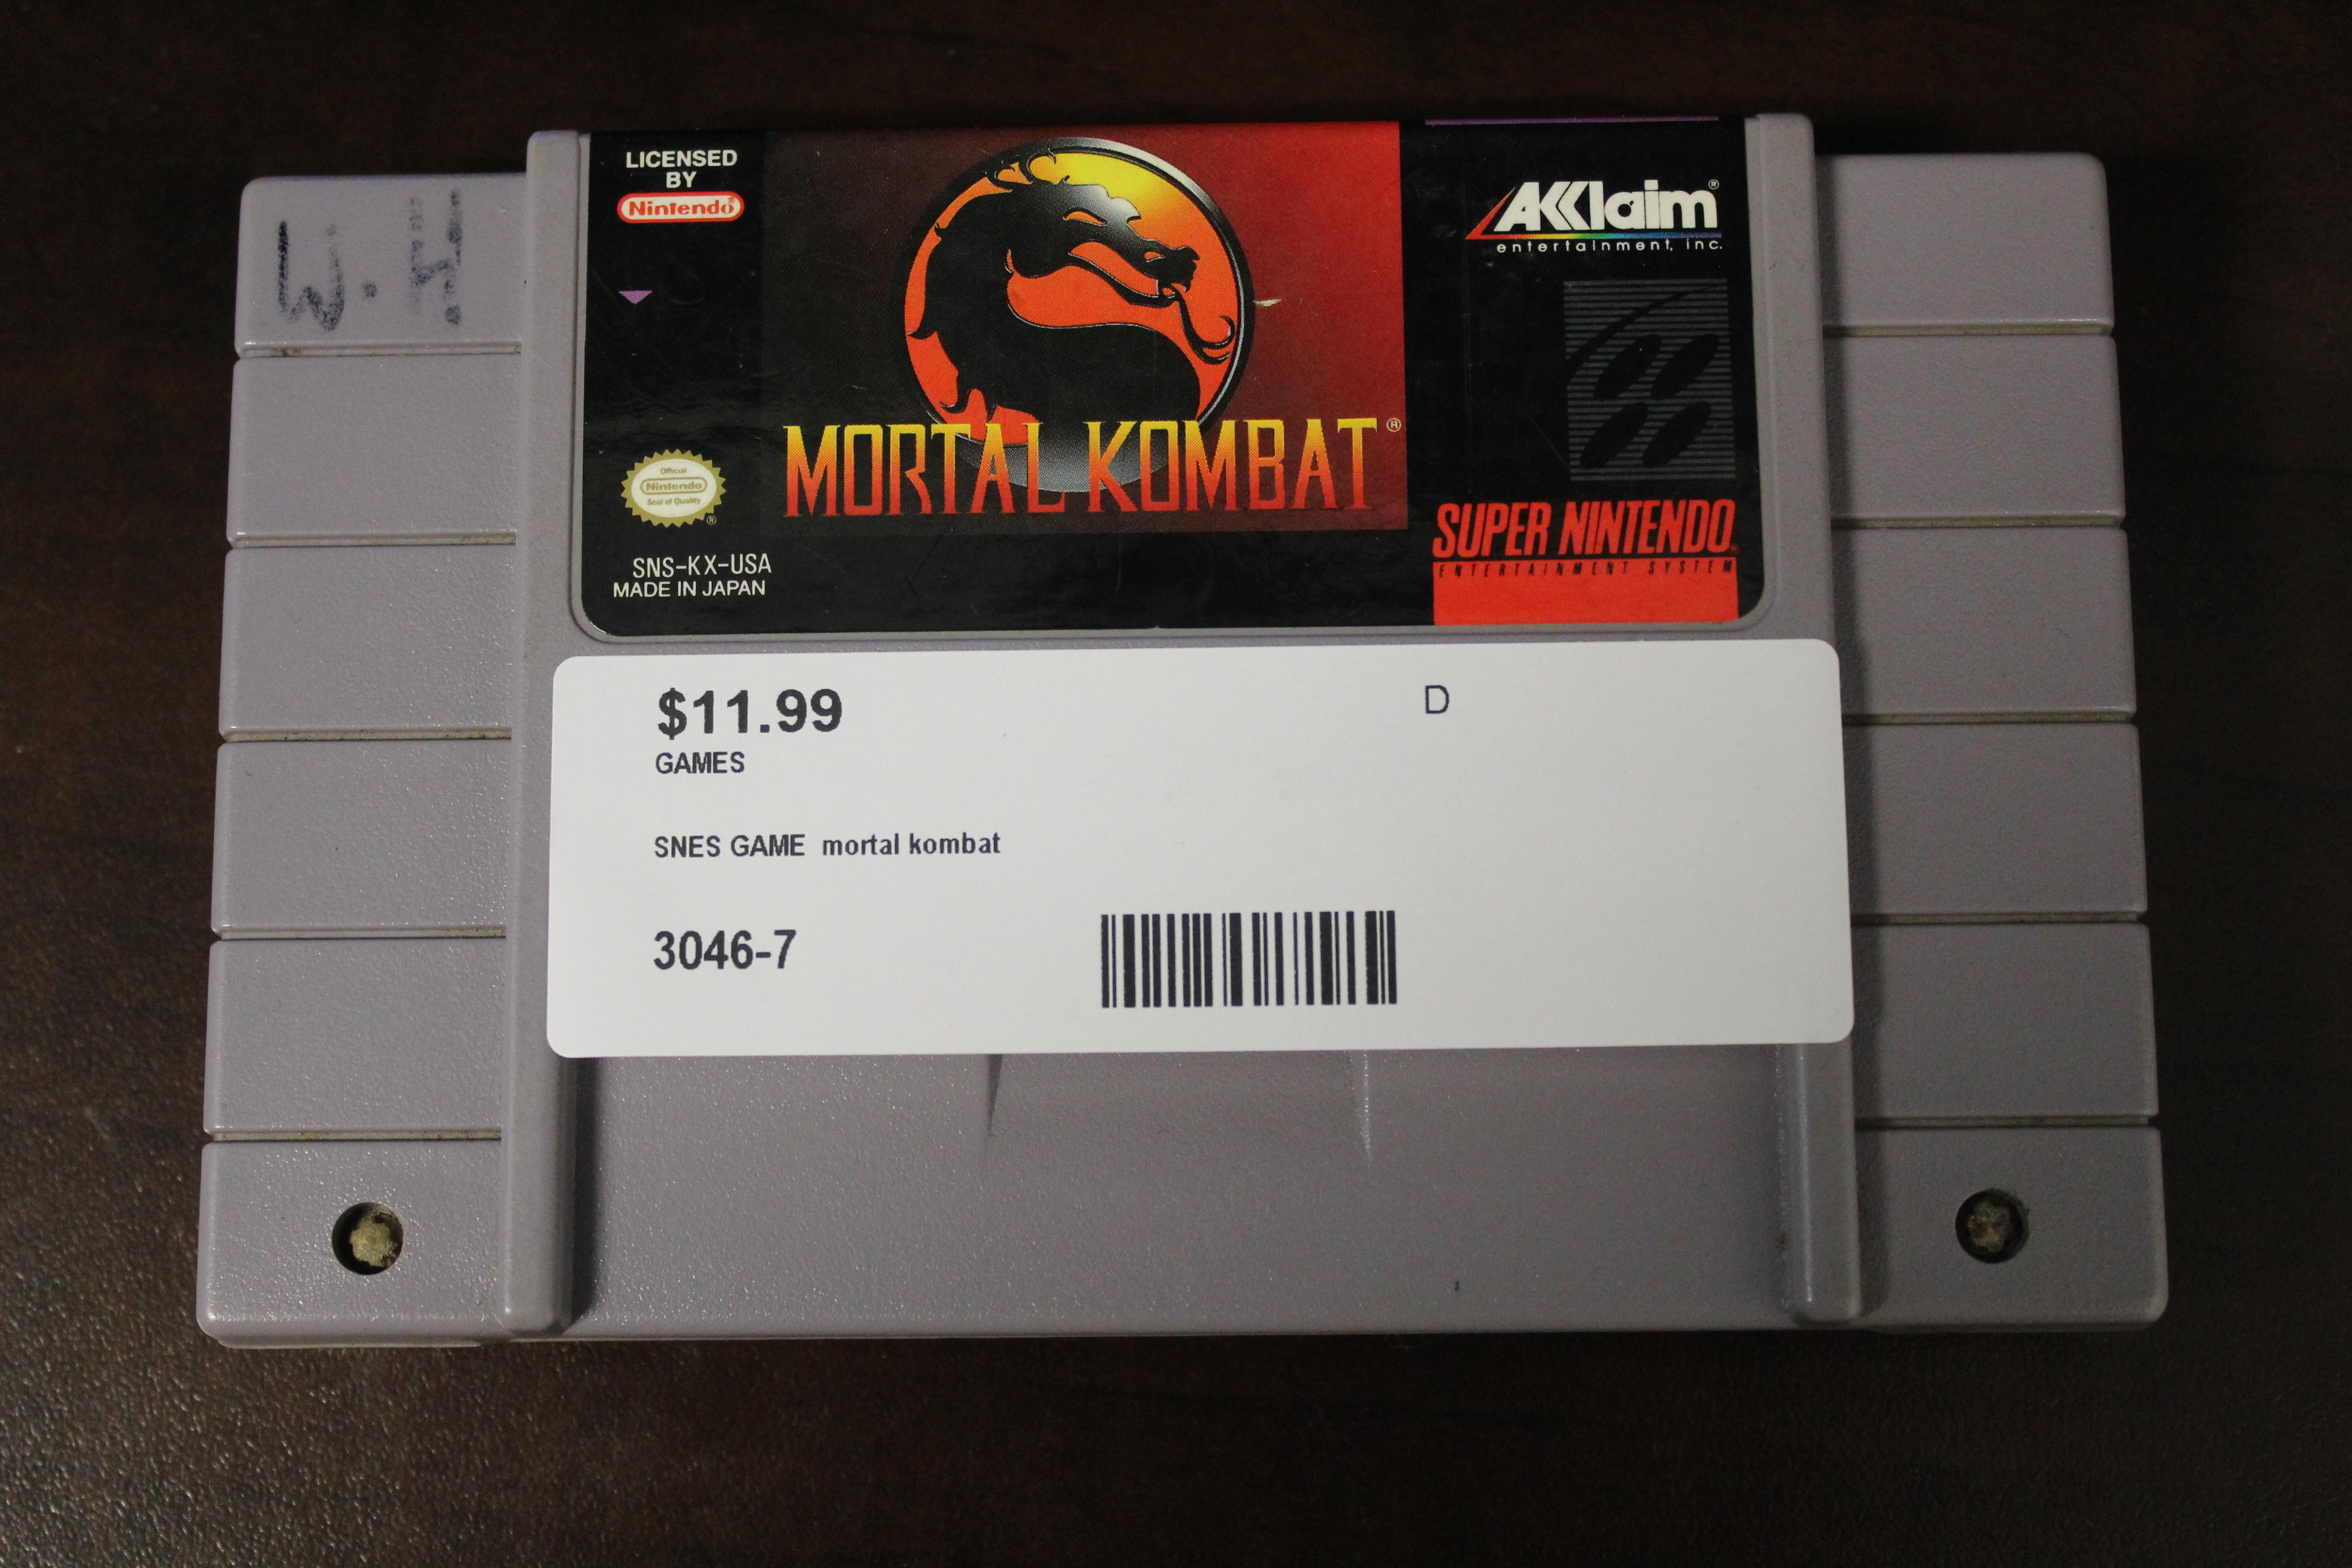 SNES GAME Mortal Kombat